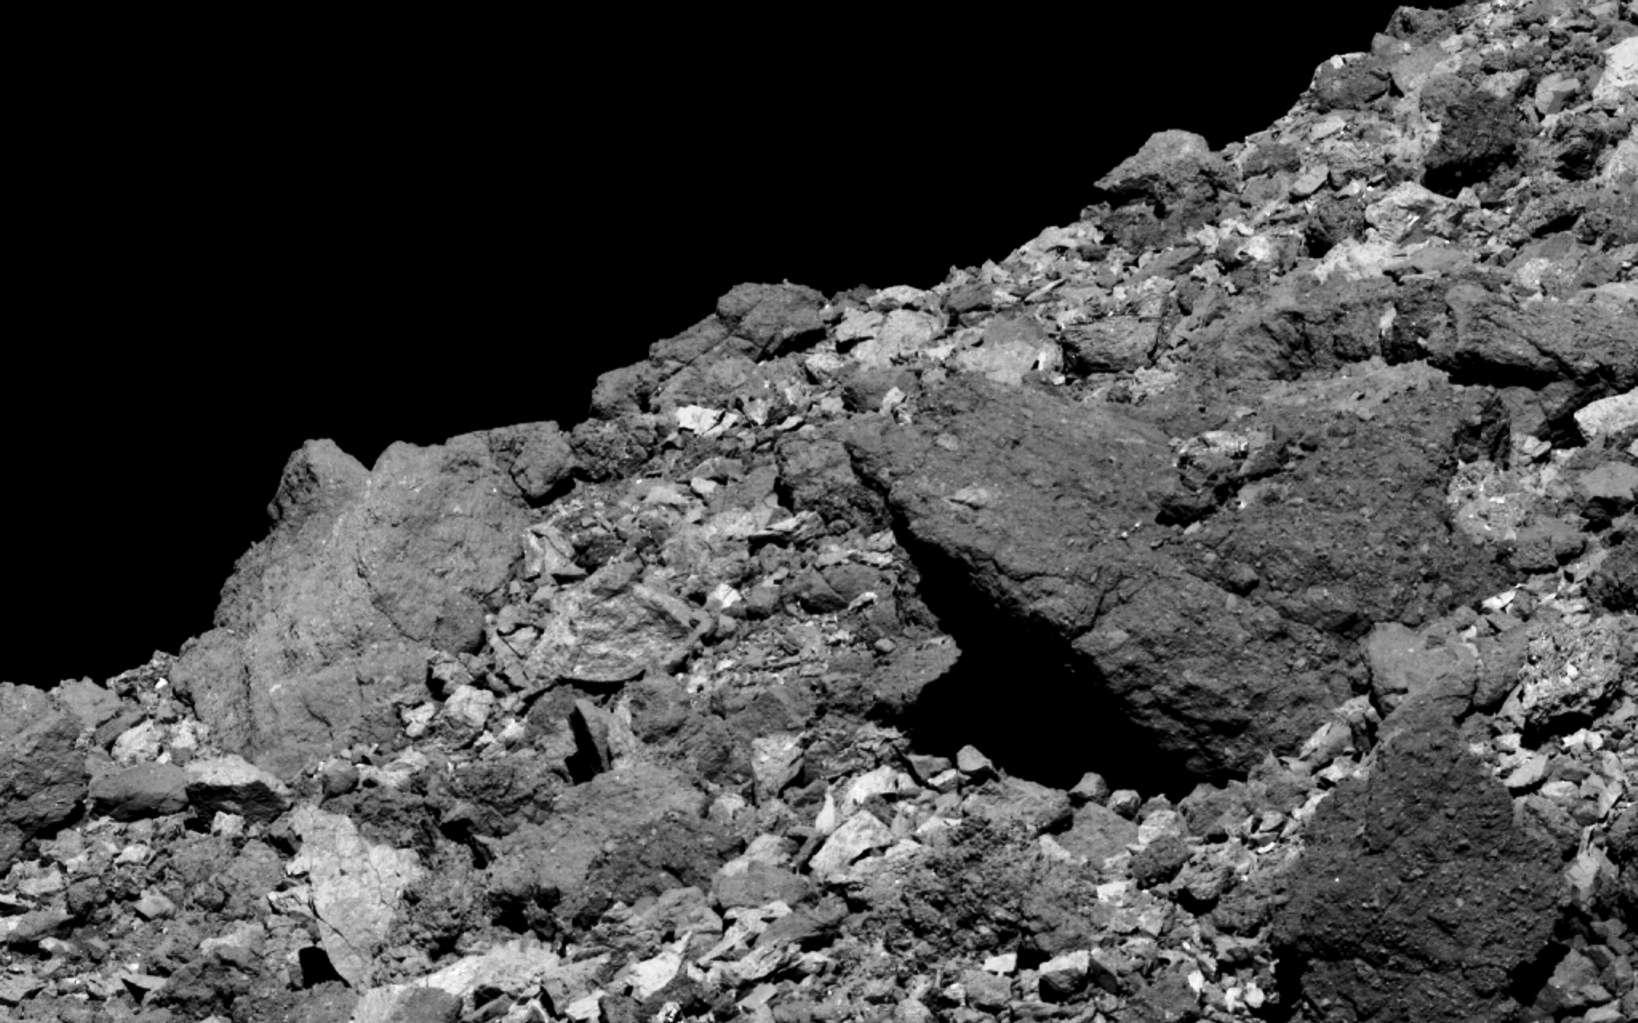 Des rochers dans l'hémisphère nord de Bénou (ou Bennu), photographiés par Osiris-Rex. © Nasa, Goddard University of Arizona